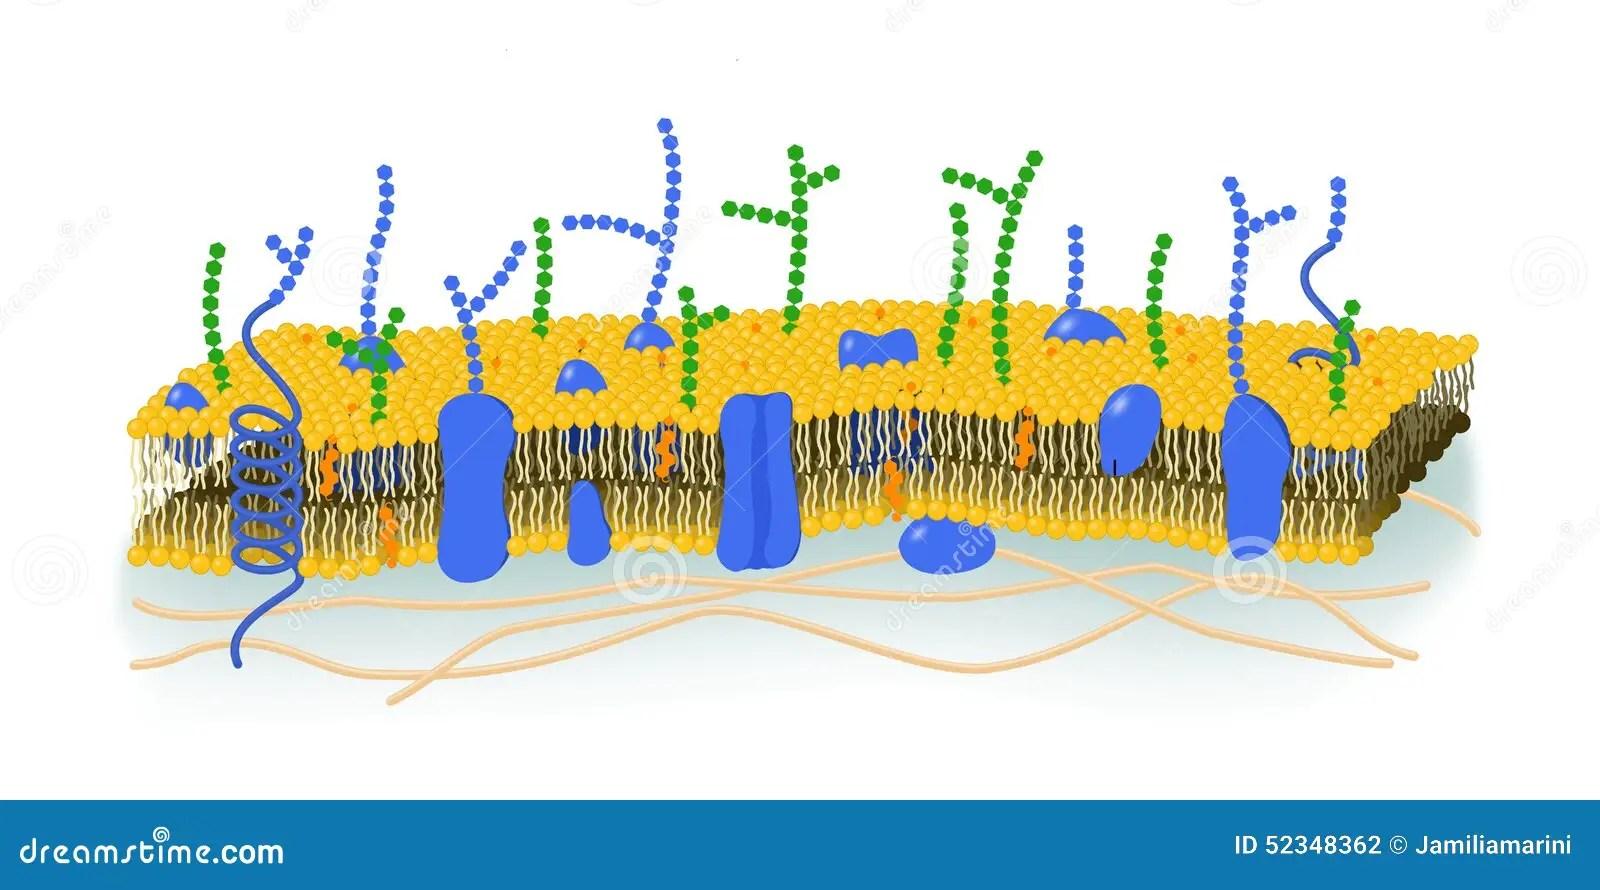 cell membrane diagram blank 2008 chevy malibu fuse box illustration stock of